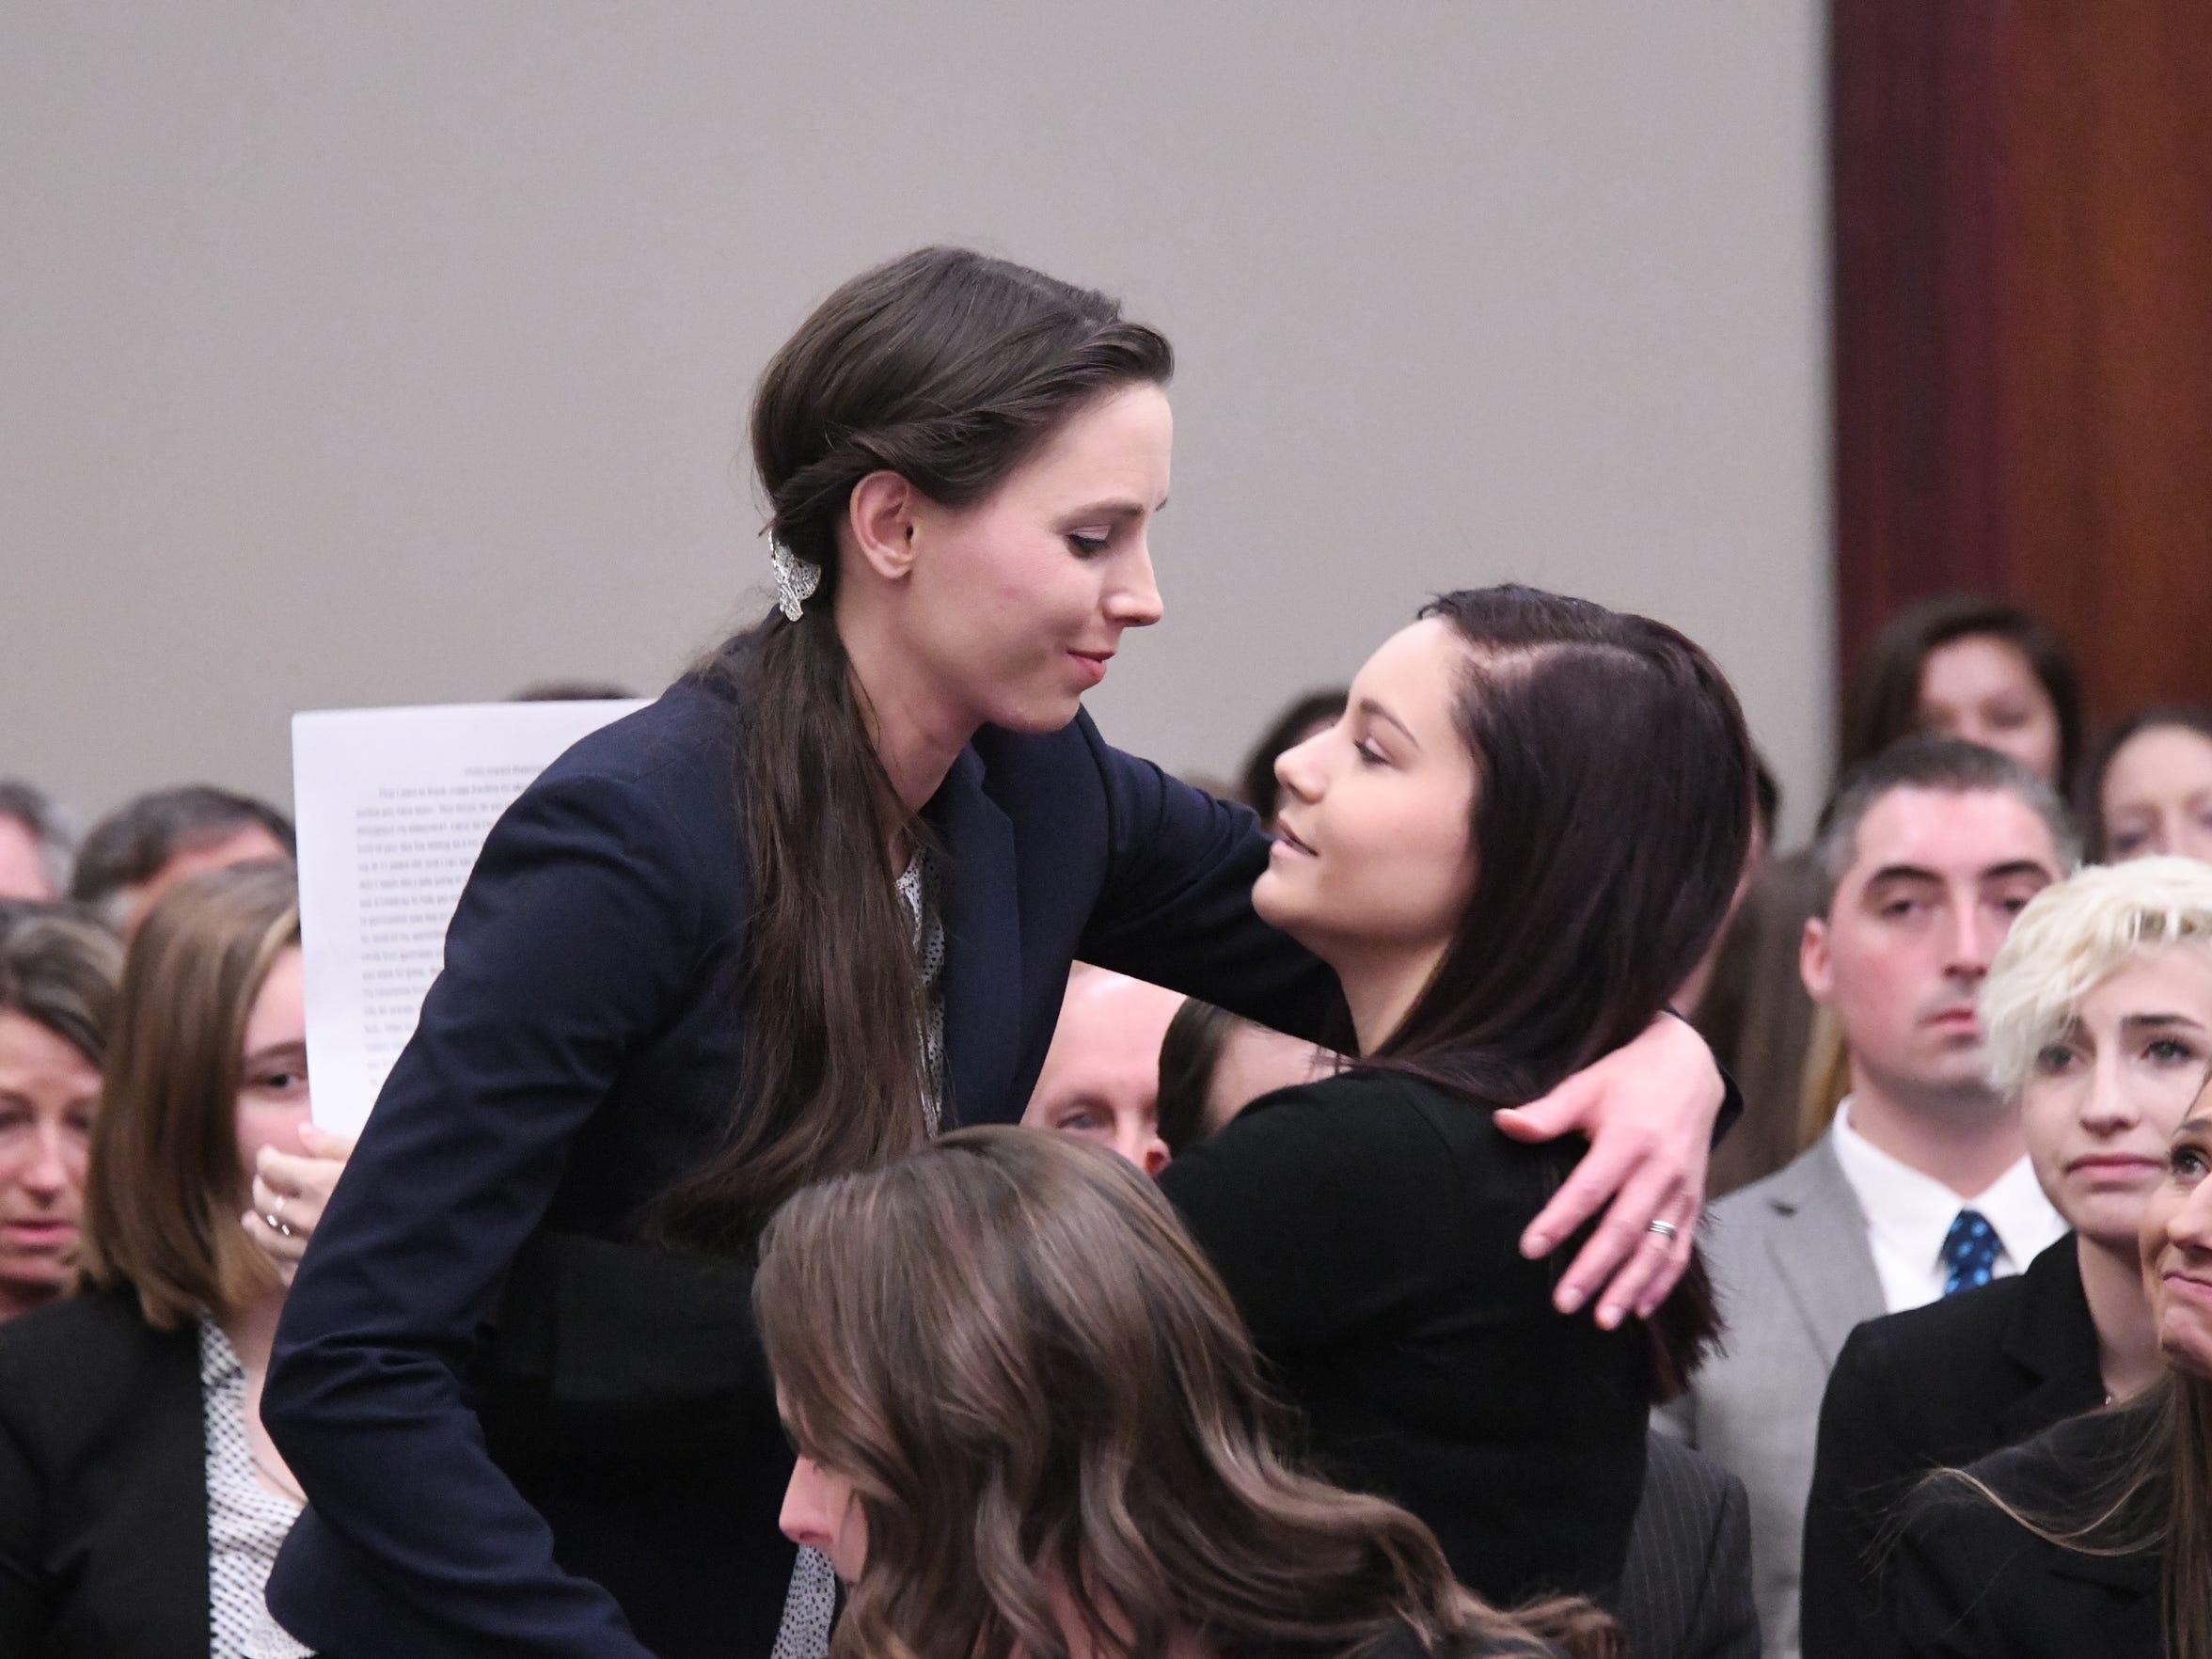 Rachael DenHollander hugs fellow Nassar victim Kaylee Lorincz after Lorincz's victim impact statement, before making her own.